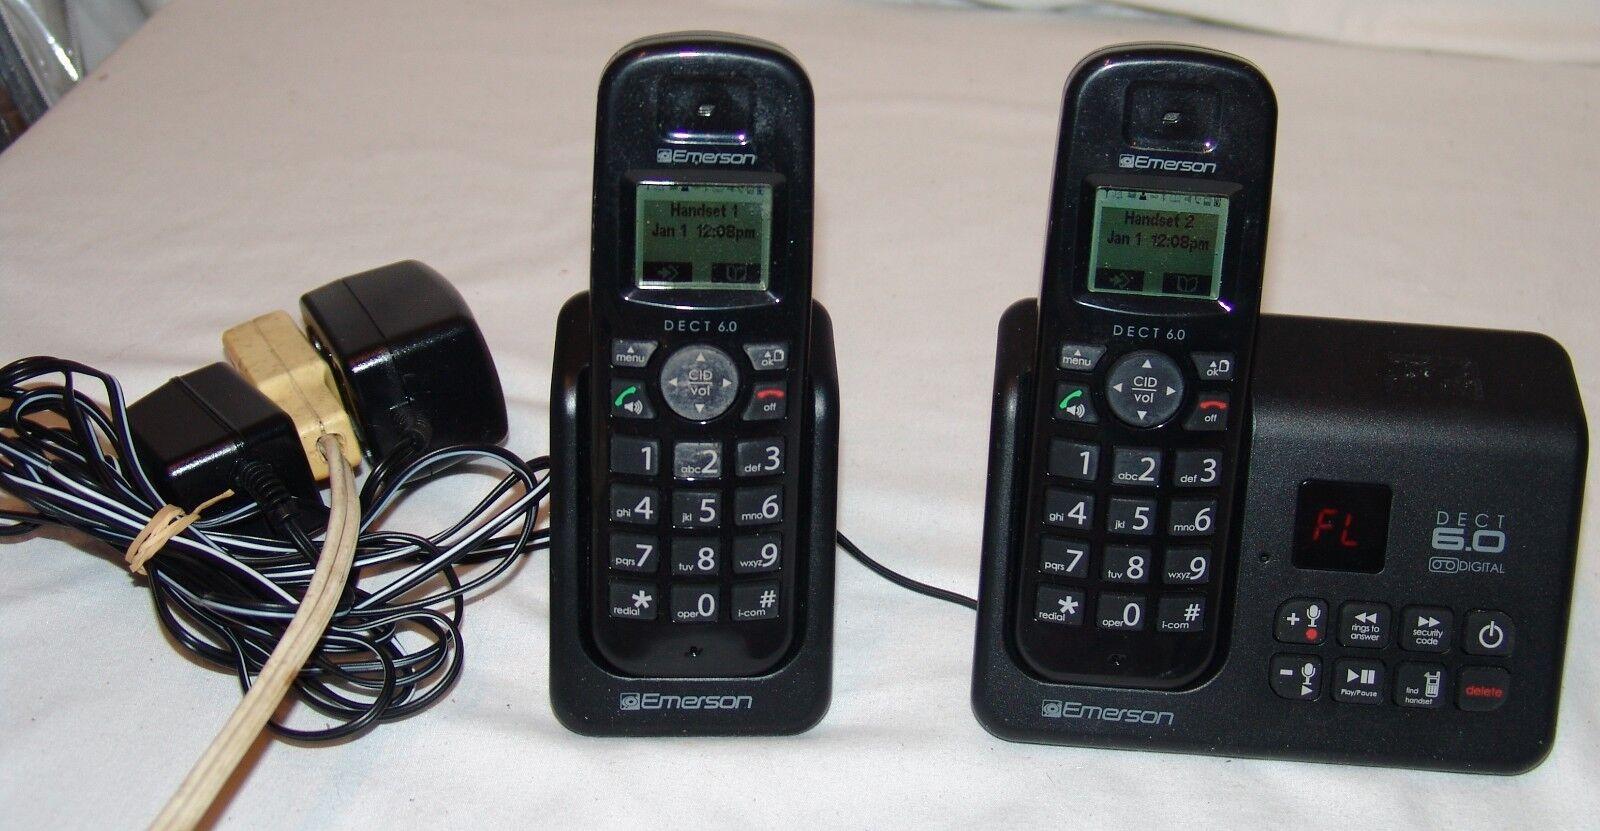 Emerson Dect 6.0 Digital Cordless Phones Bases Answering Mac